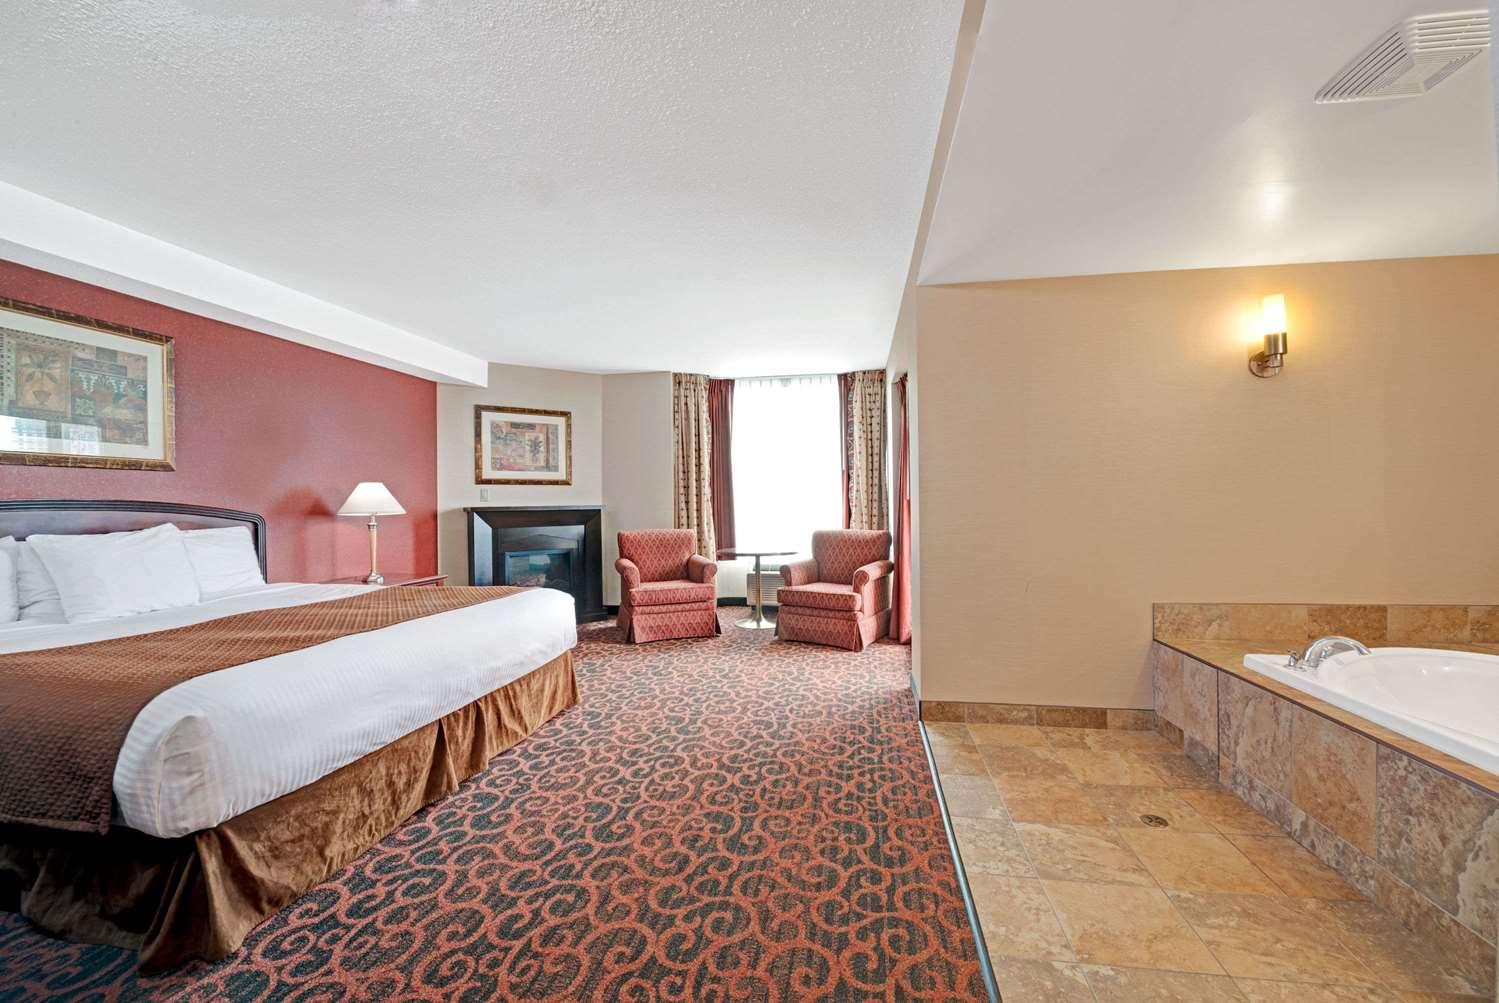 Ramada Inn Niagara Falls On See Discounts